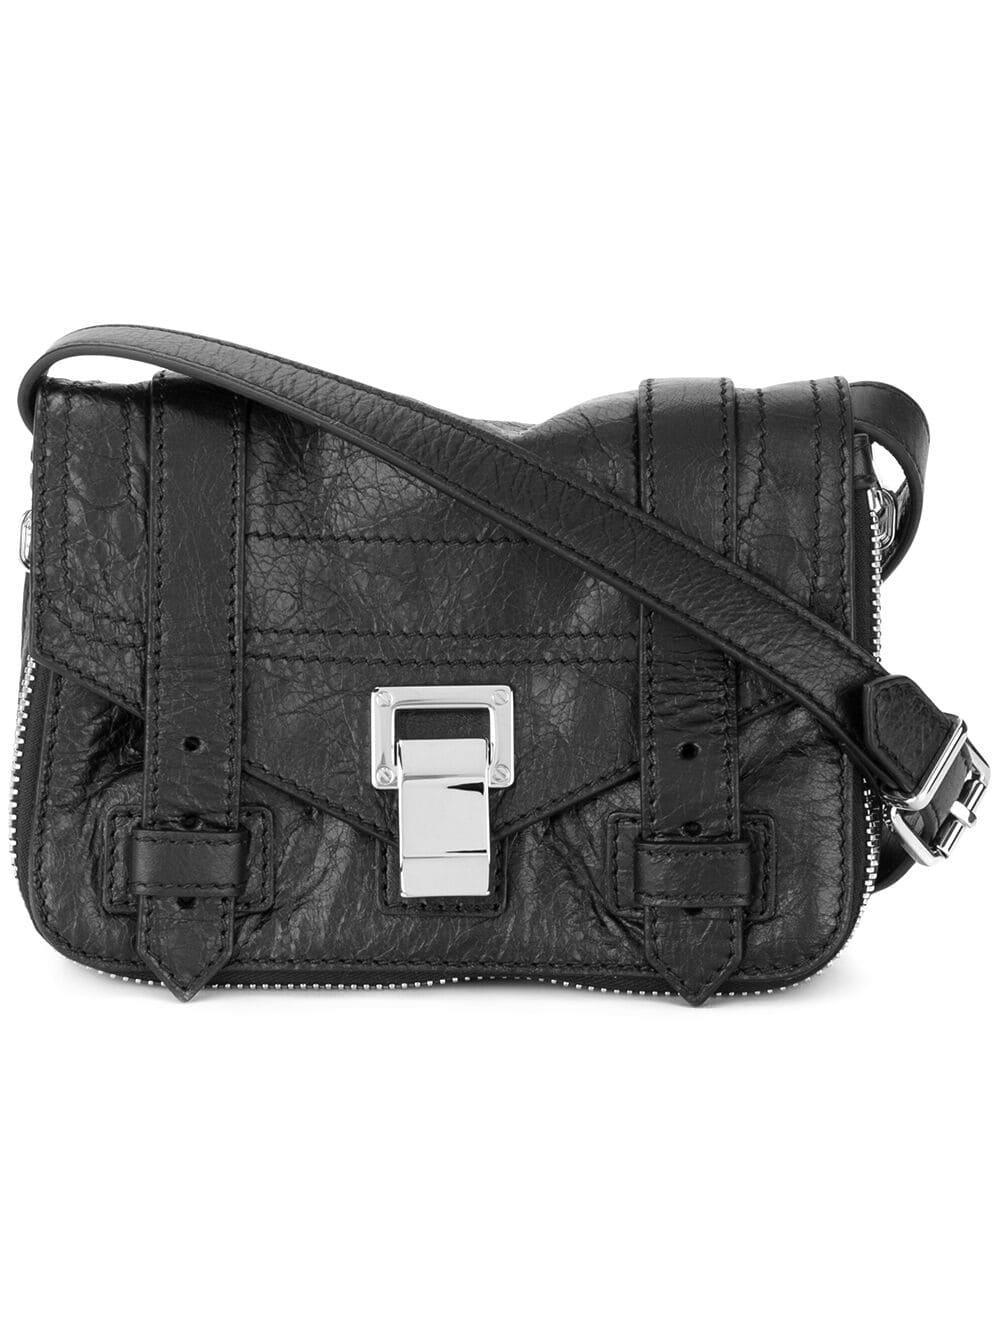 Black Zip Women's Bag Crossbody Ps1Mini nyNwv8Om0P